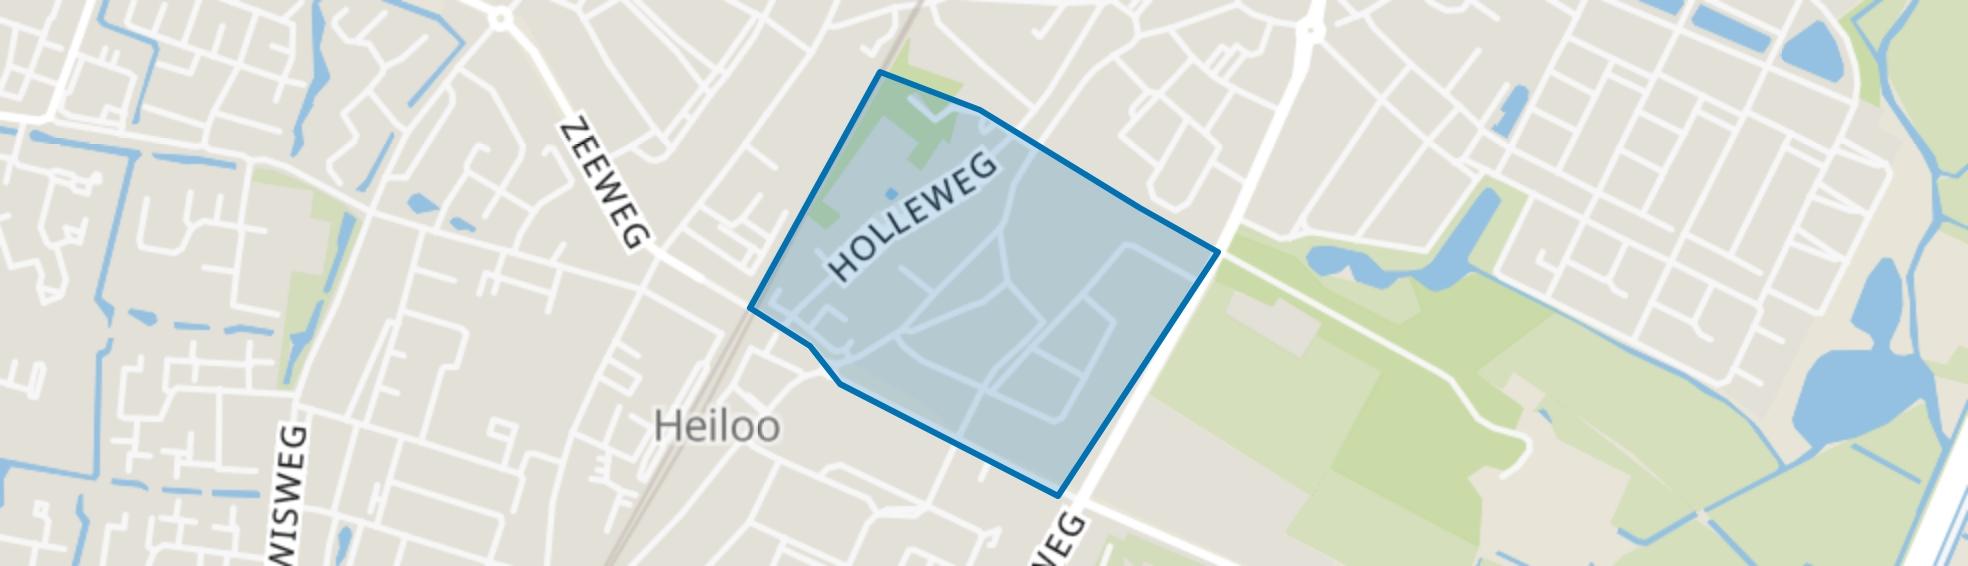 Gemeentebos, Heiloo map